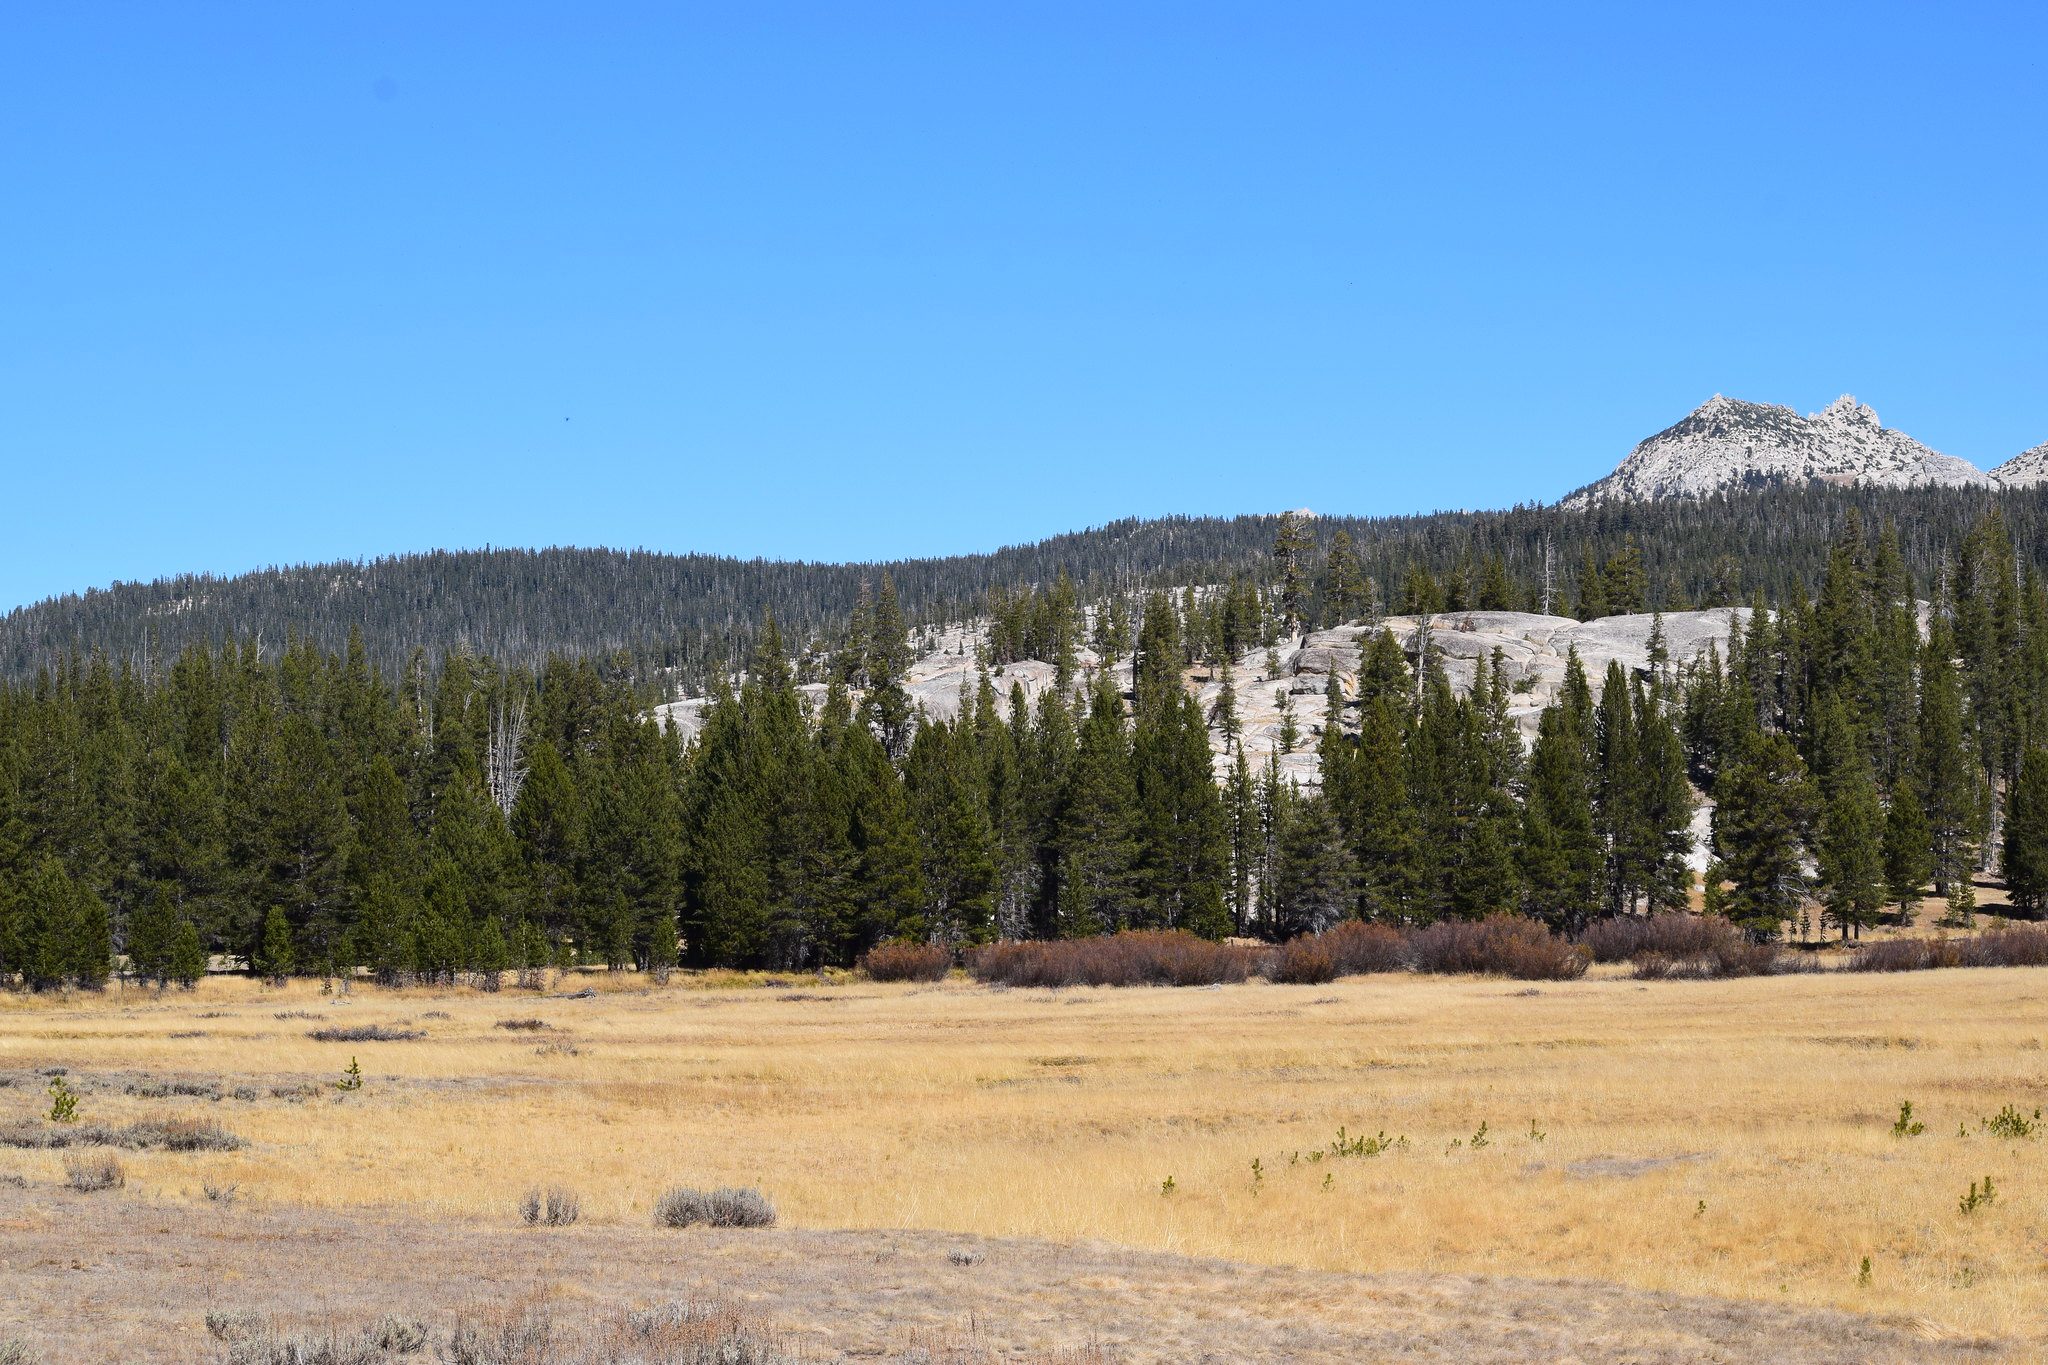 Tuolumne Meadows Yosemite NP on the road to Tioga Pass